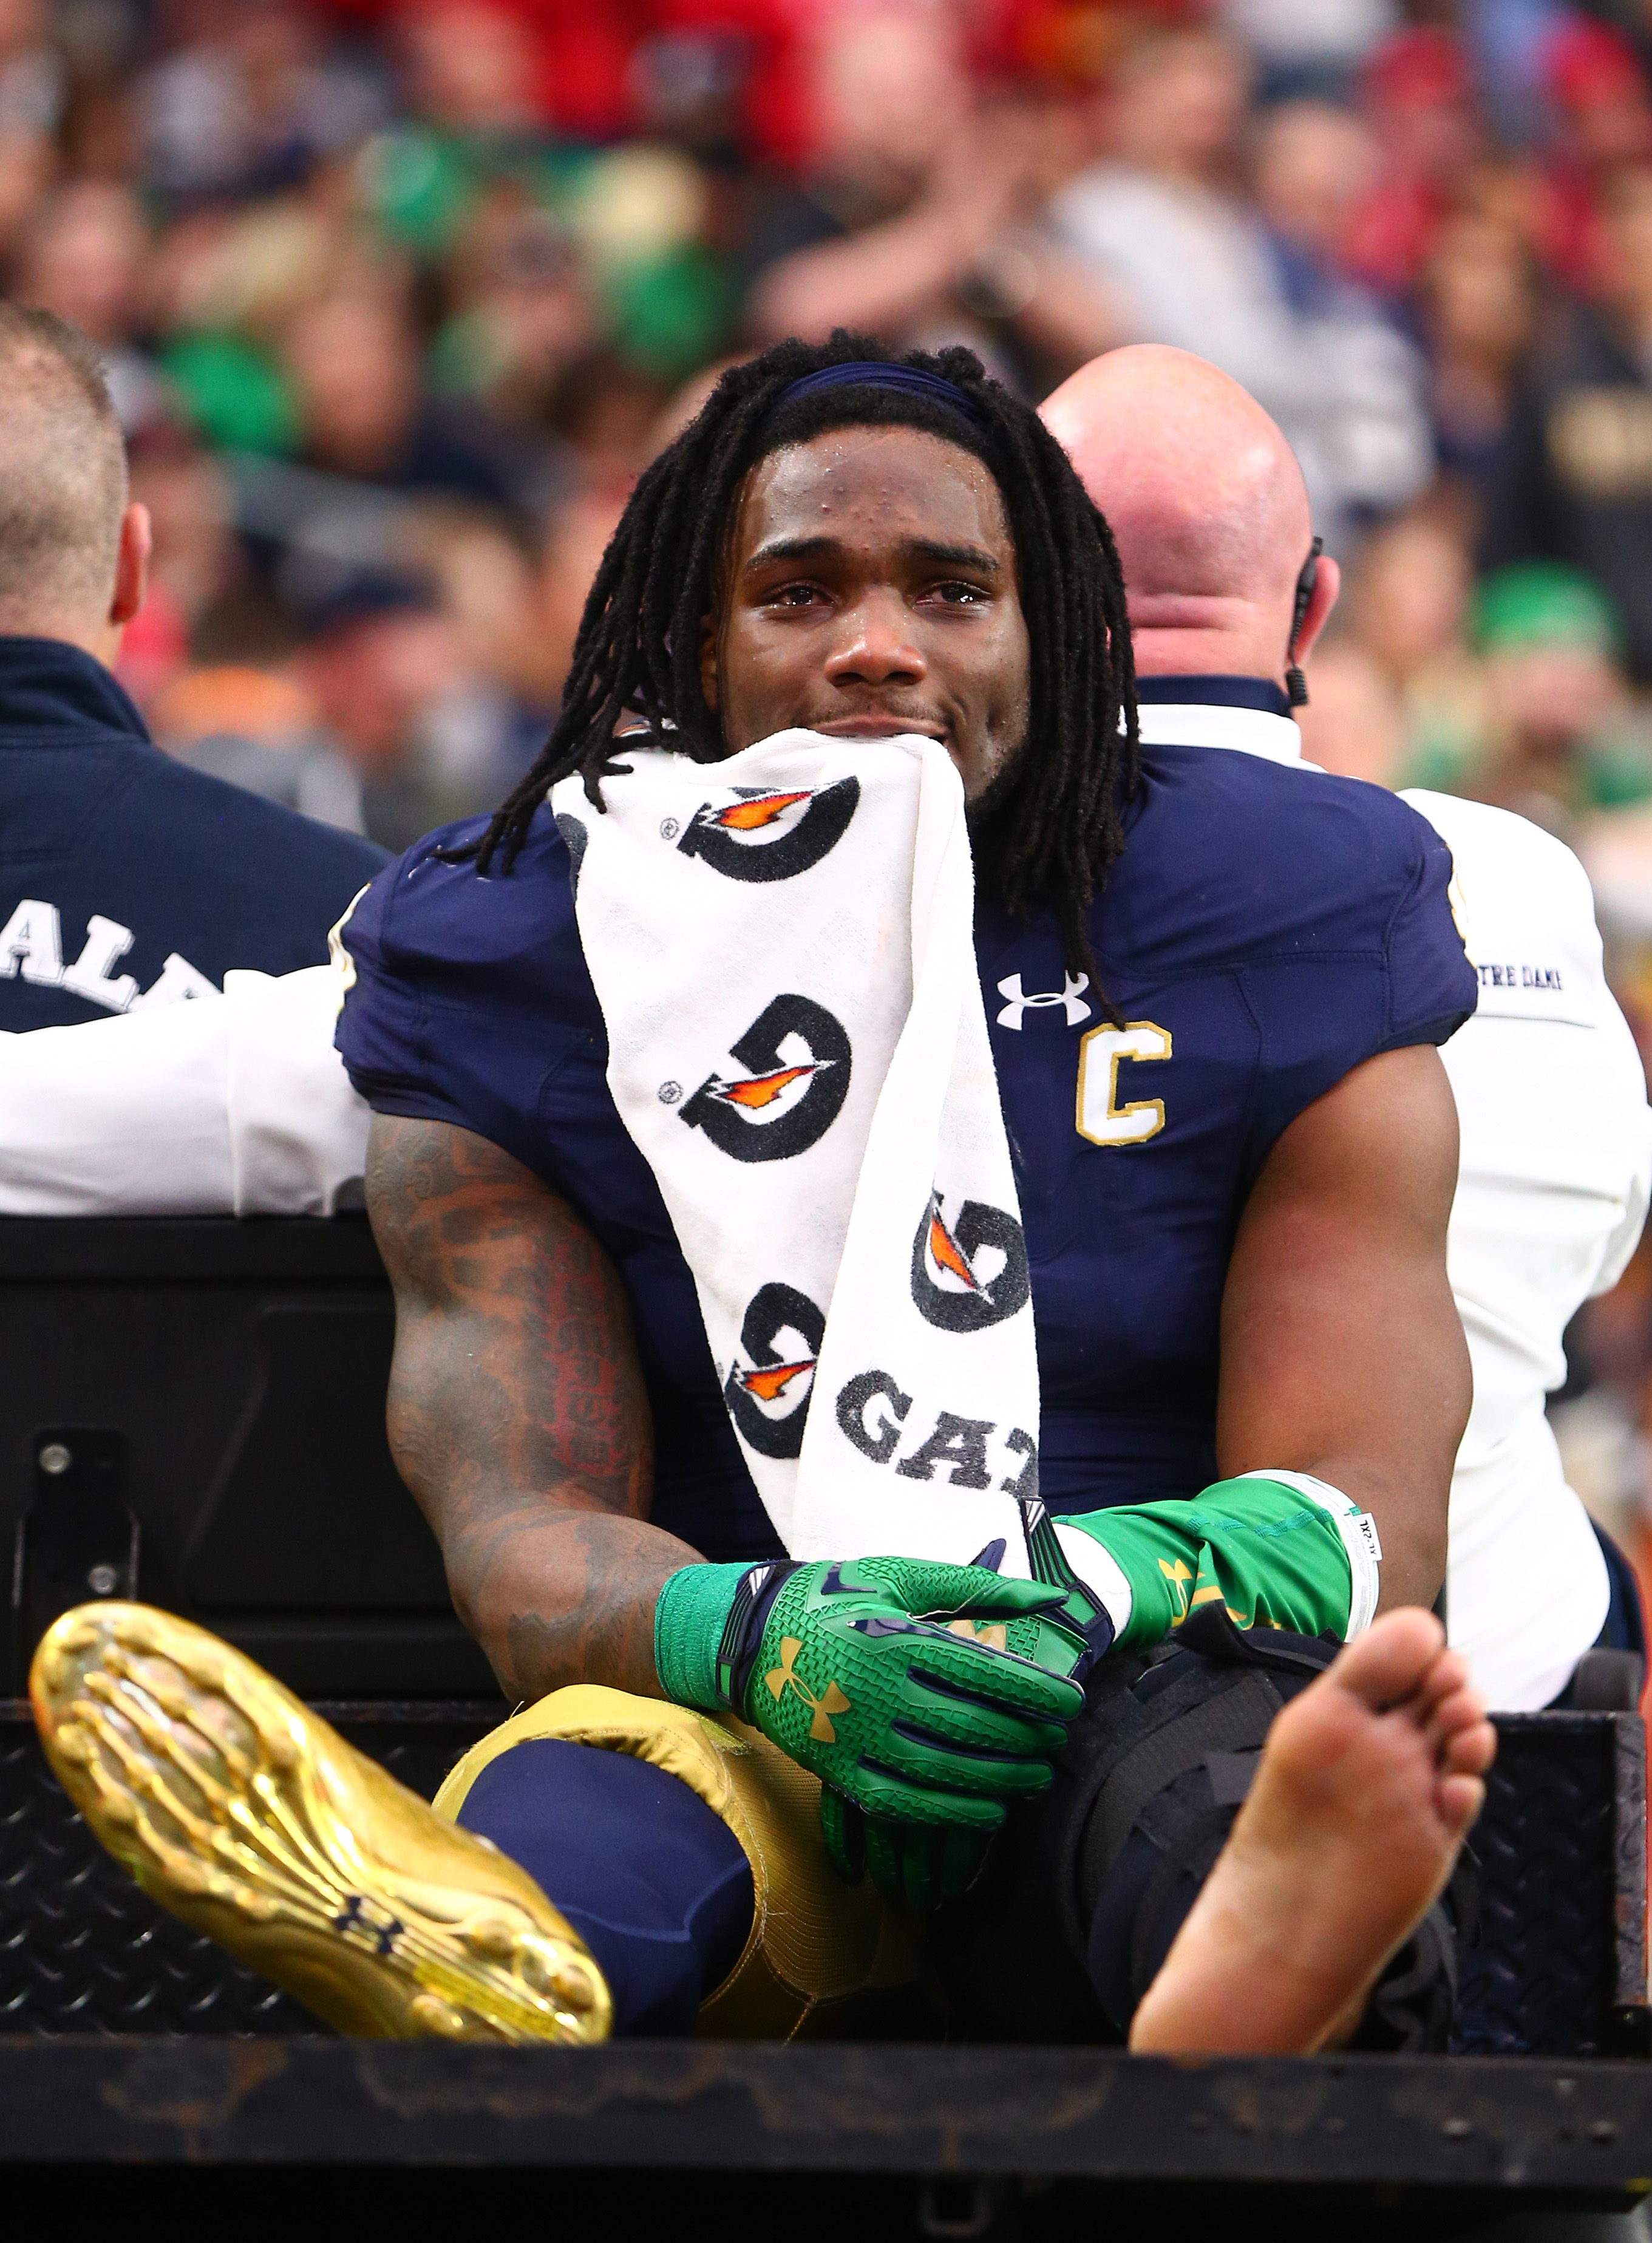 Notre Dame Lb Jaylon Smith To Enter Draft